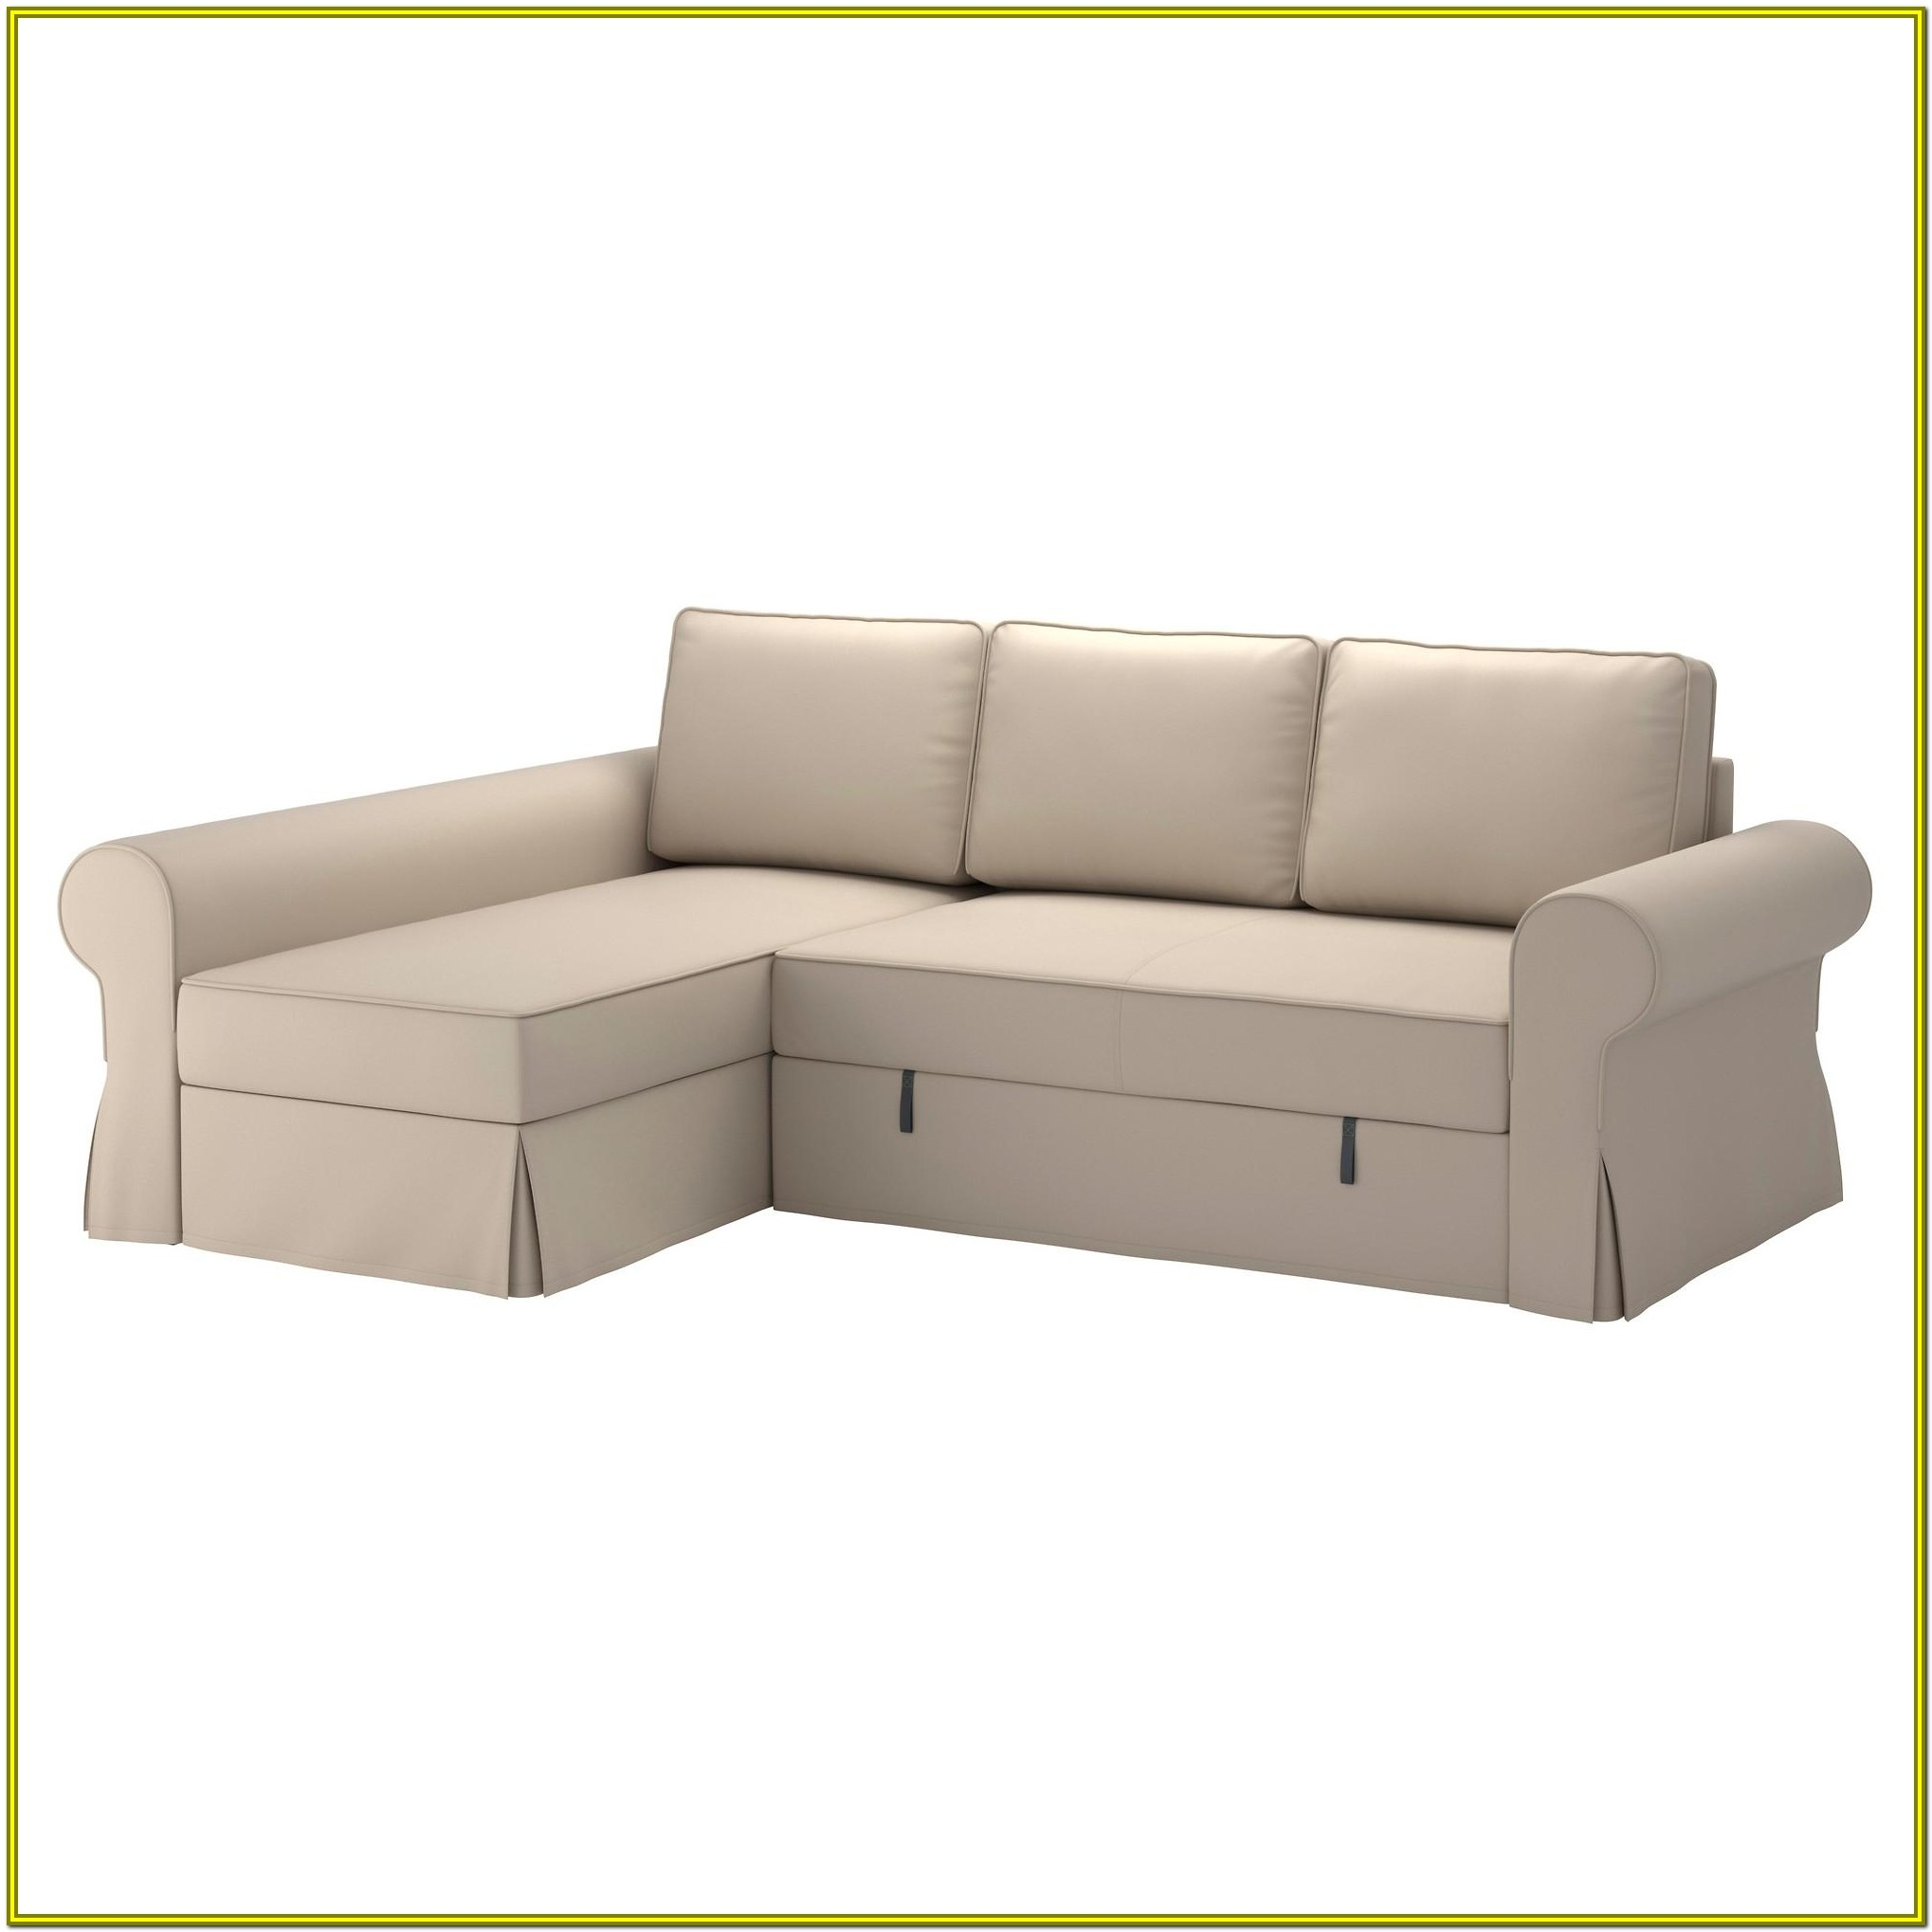 Sofa Bed Chaise Lounge Ikea